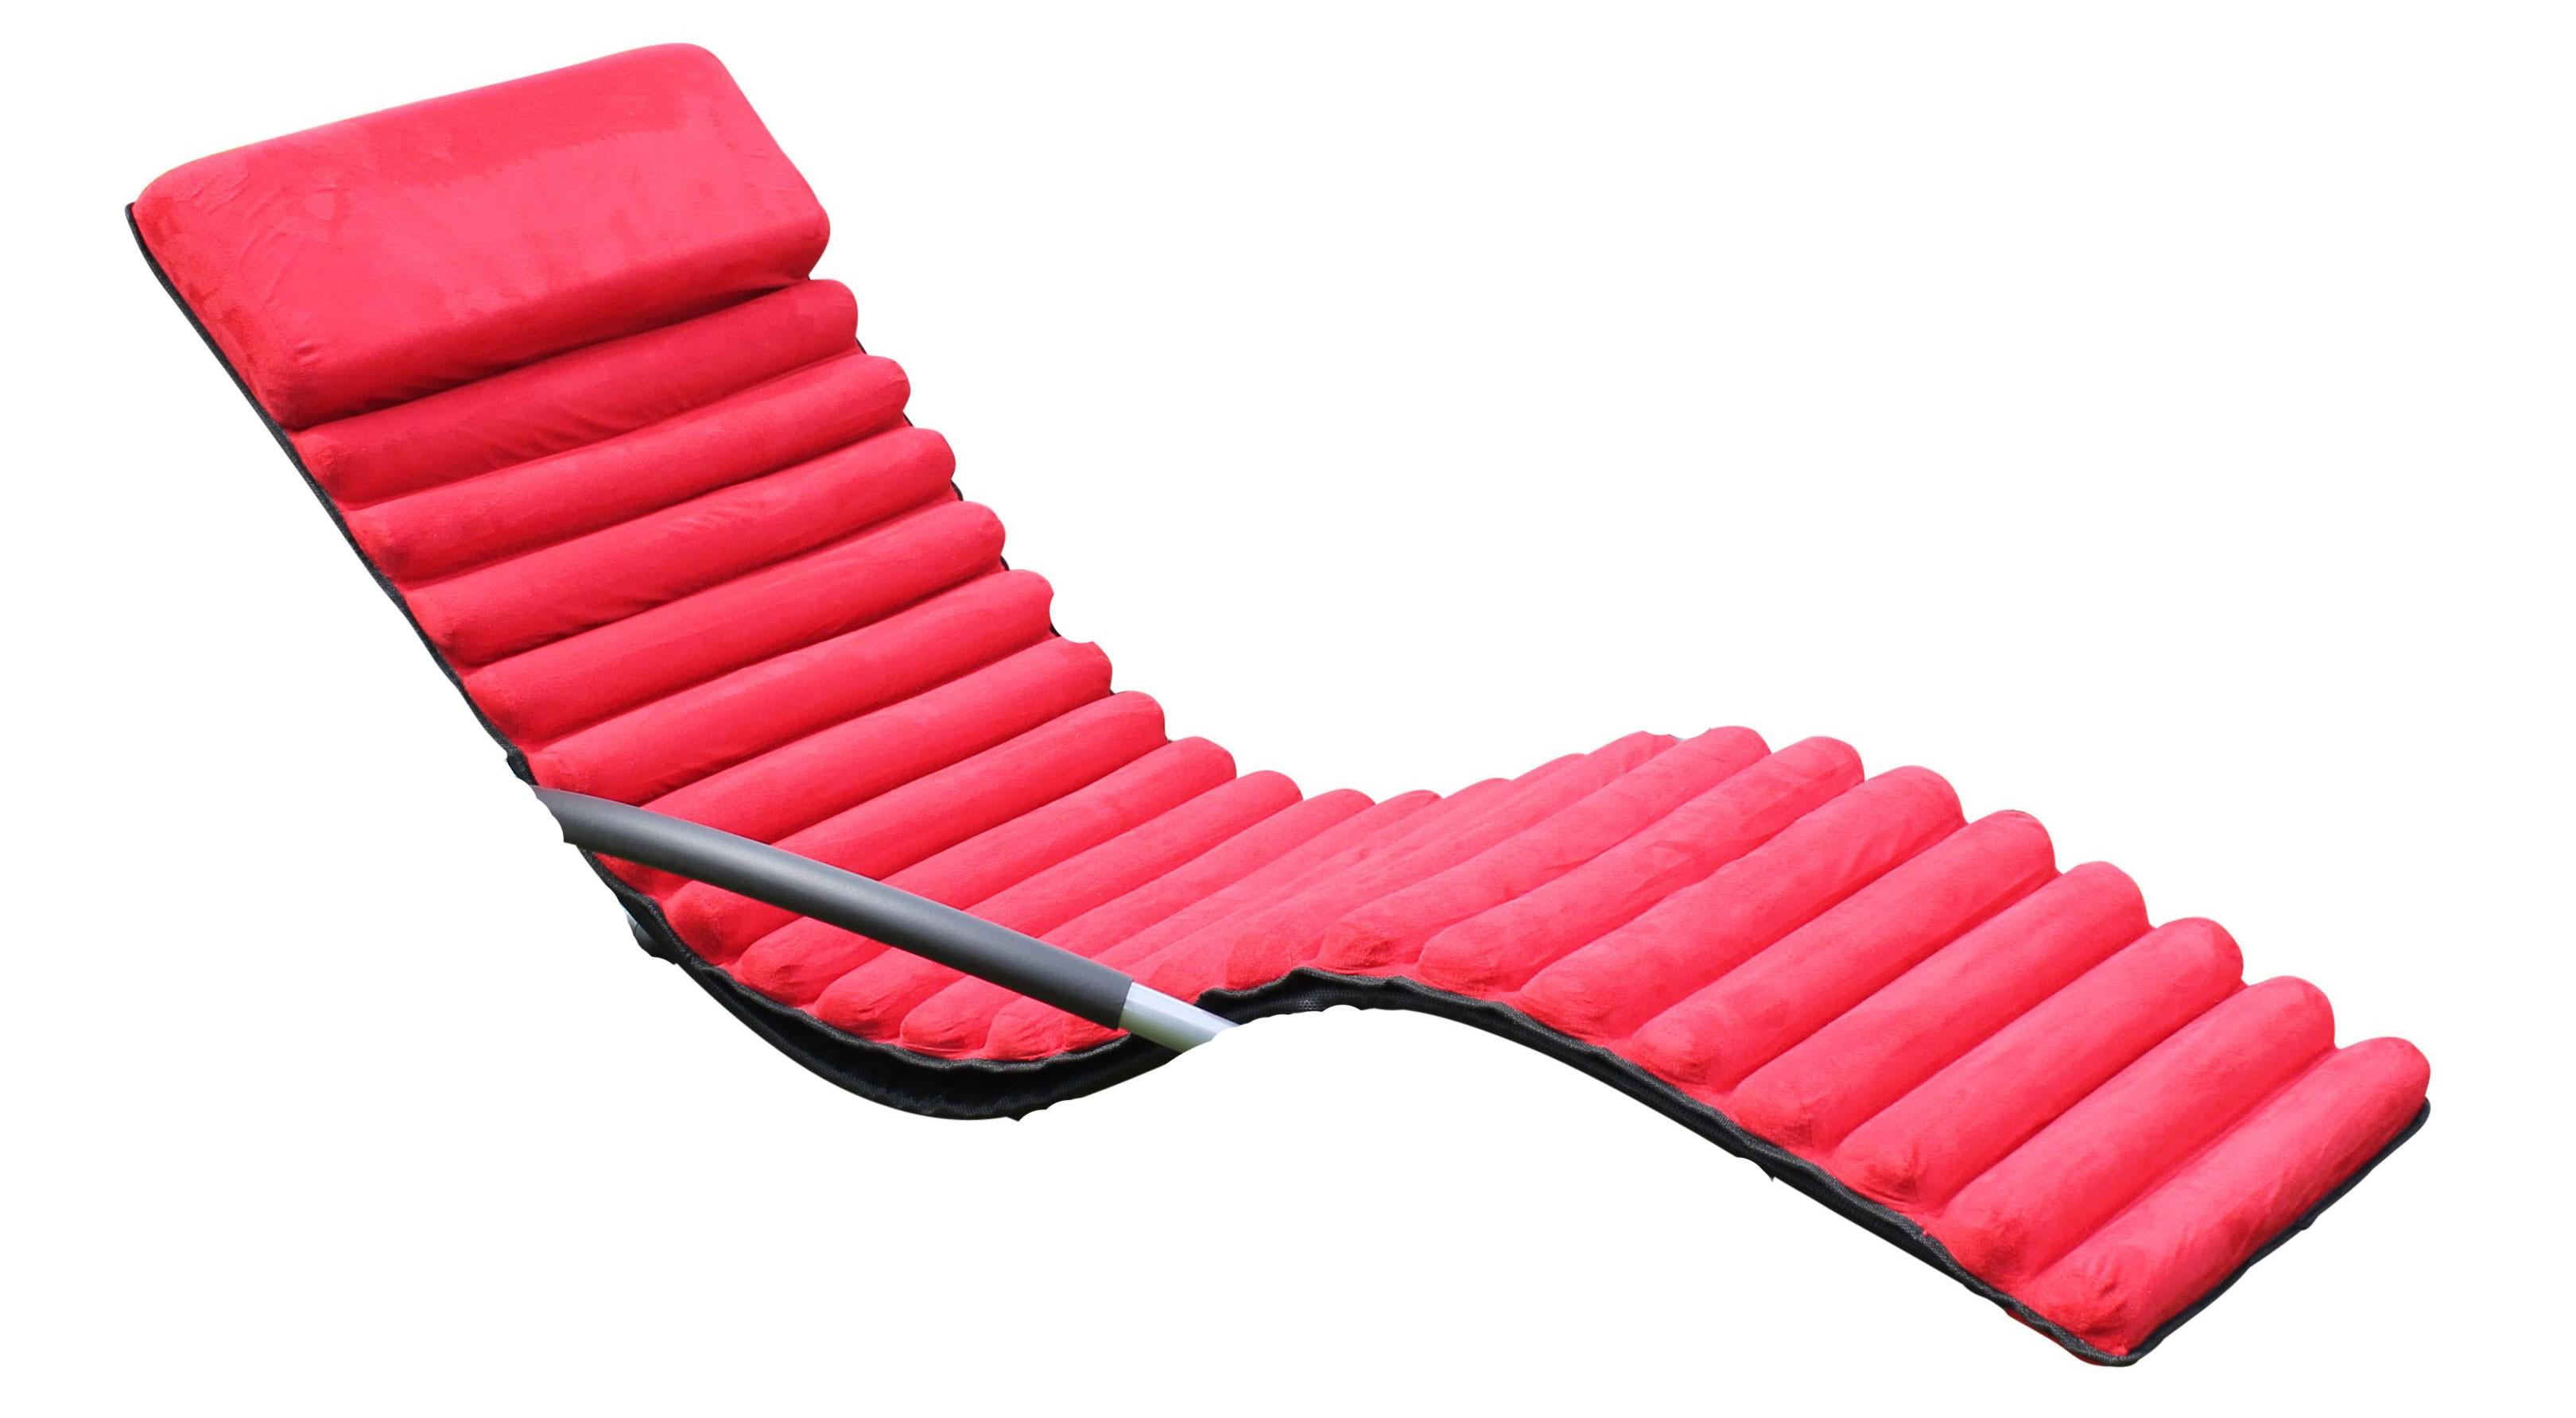 polster auflagen schaukelstuhlkissen f r leco schaukelstuhl rot bei. Black Bedroom Furniture Sets. Home Design Ideas